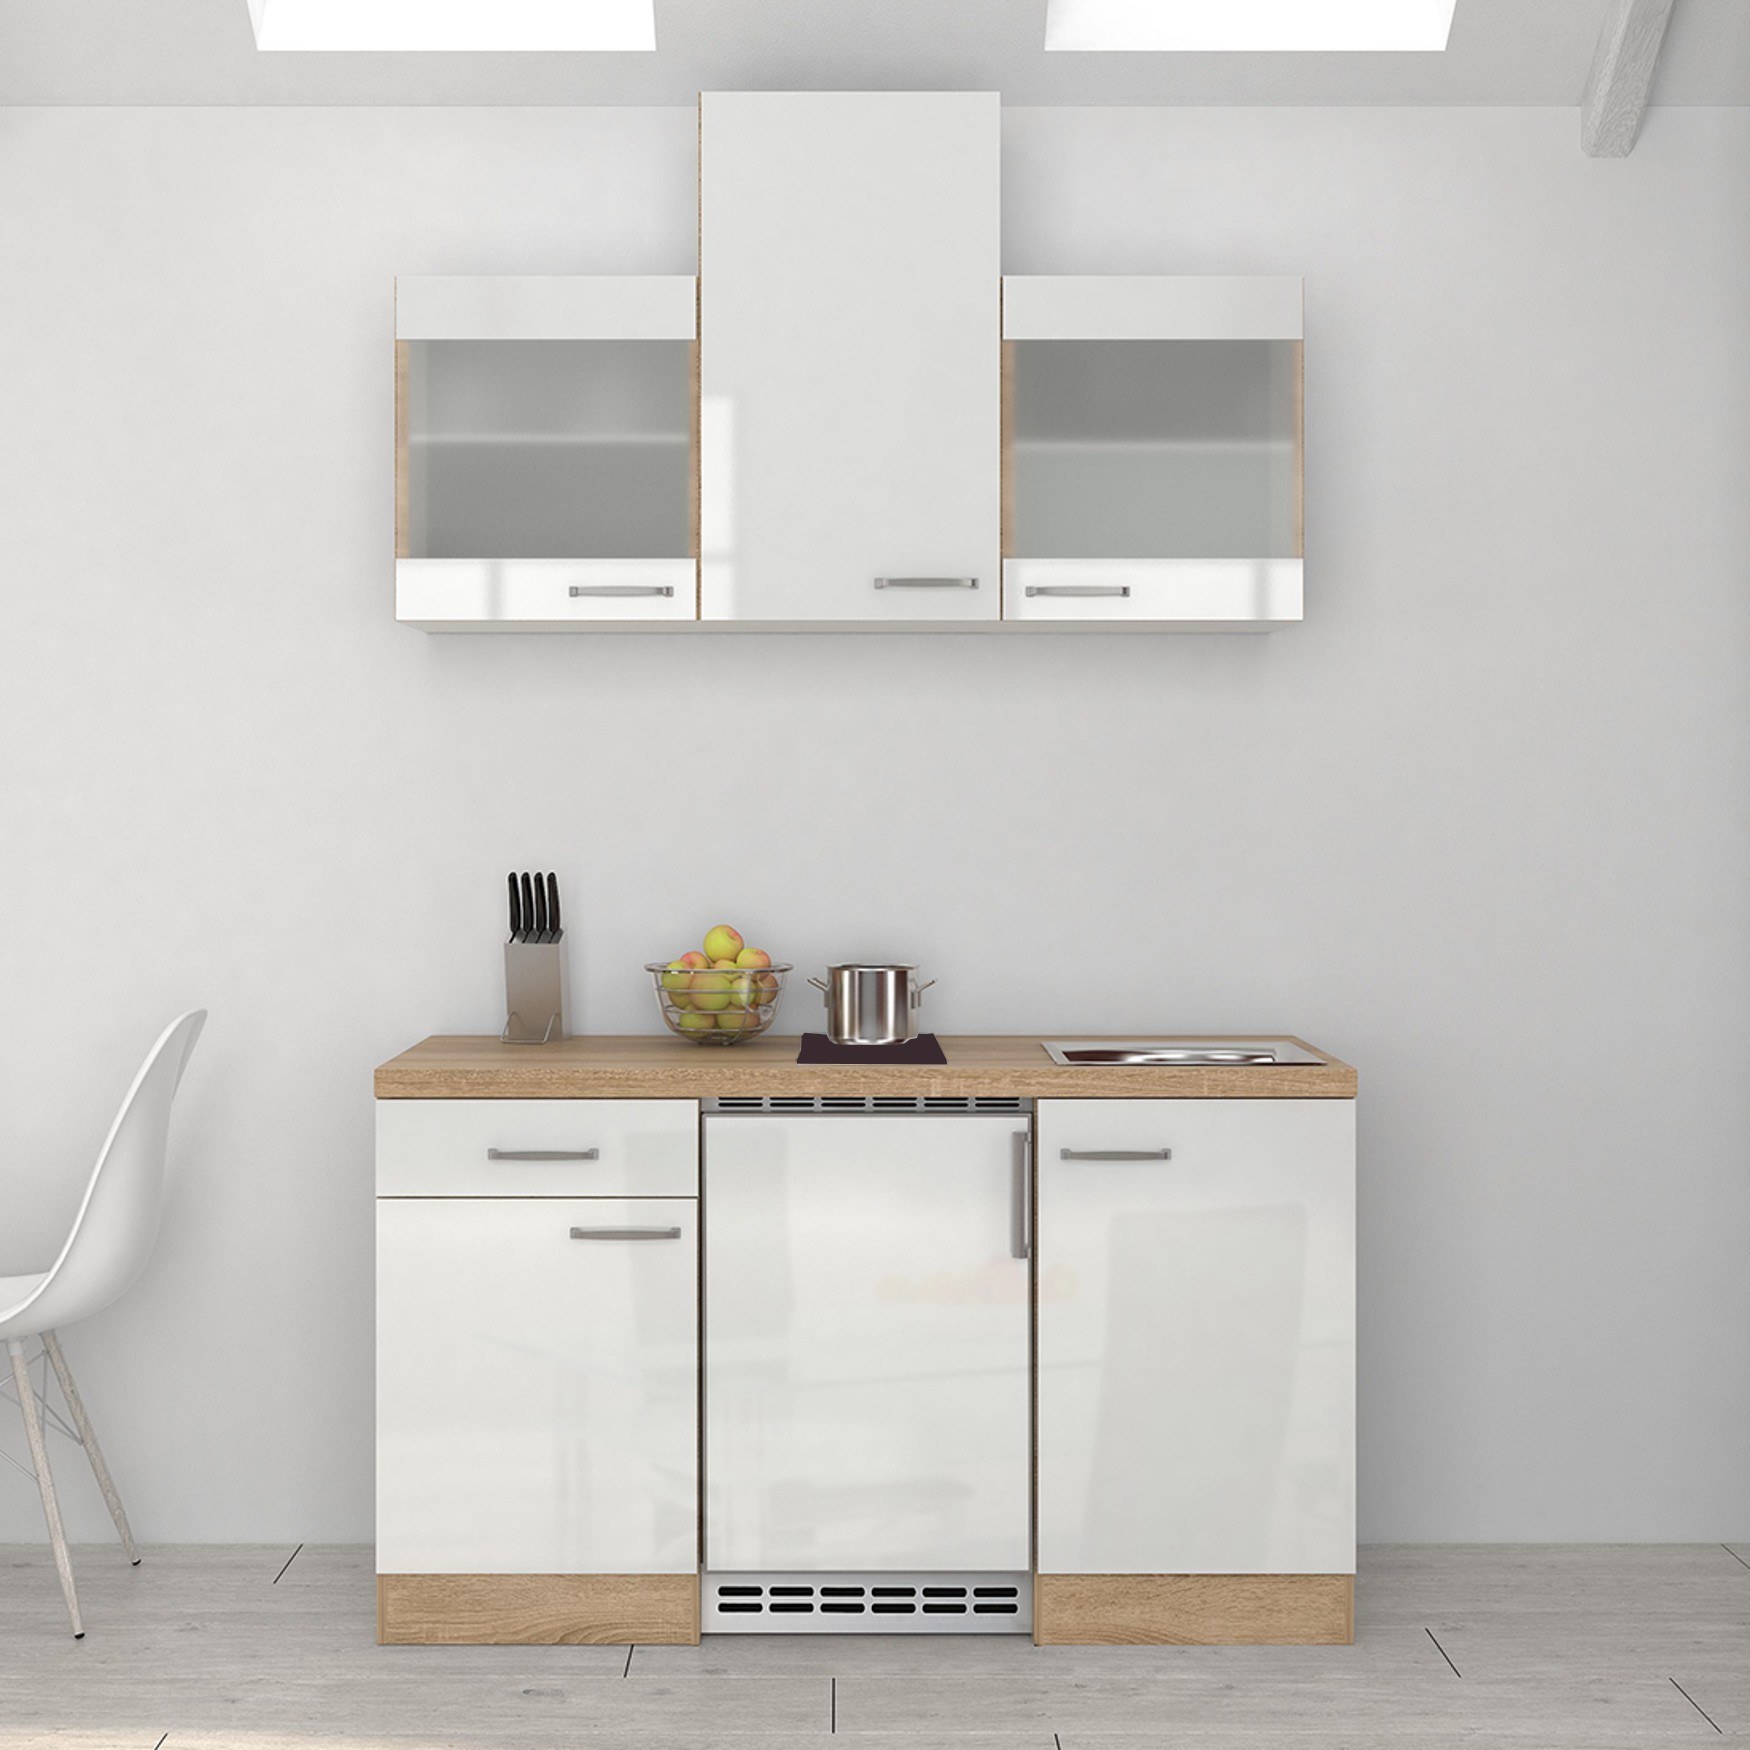 singlek che venedig mit 2er glaskeramik kochfeld breite 150 cm wei k che singlek chen. Black Bedroom Furniture Sets. Home Design Ideas